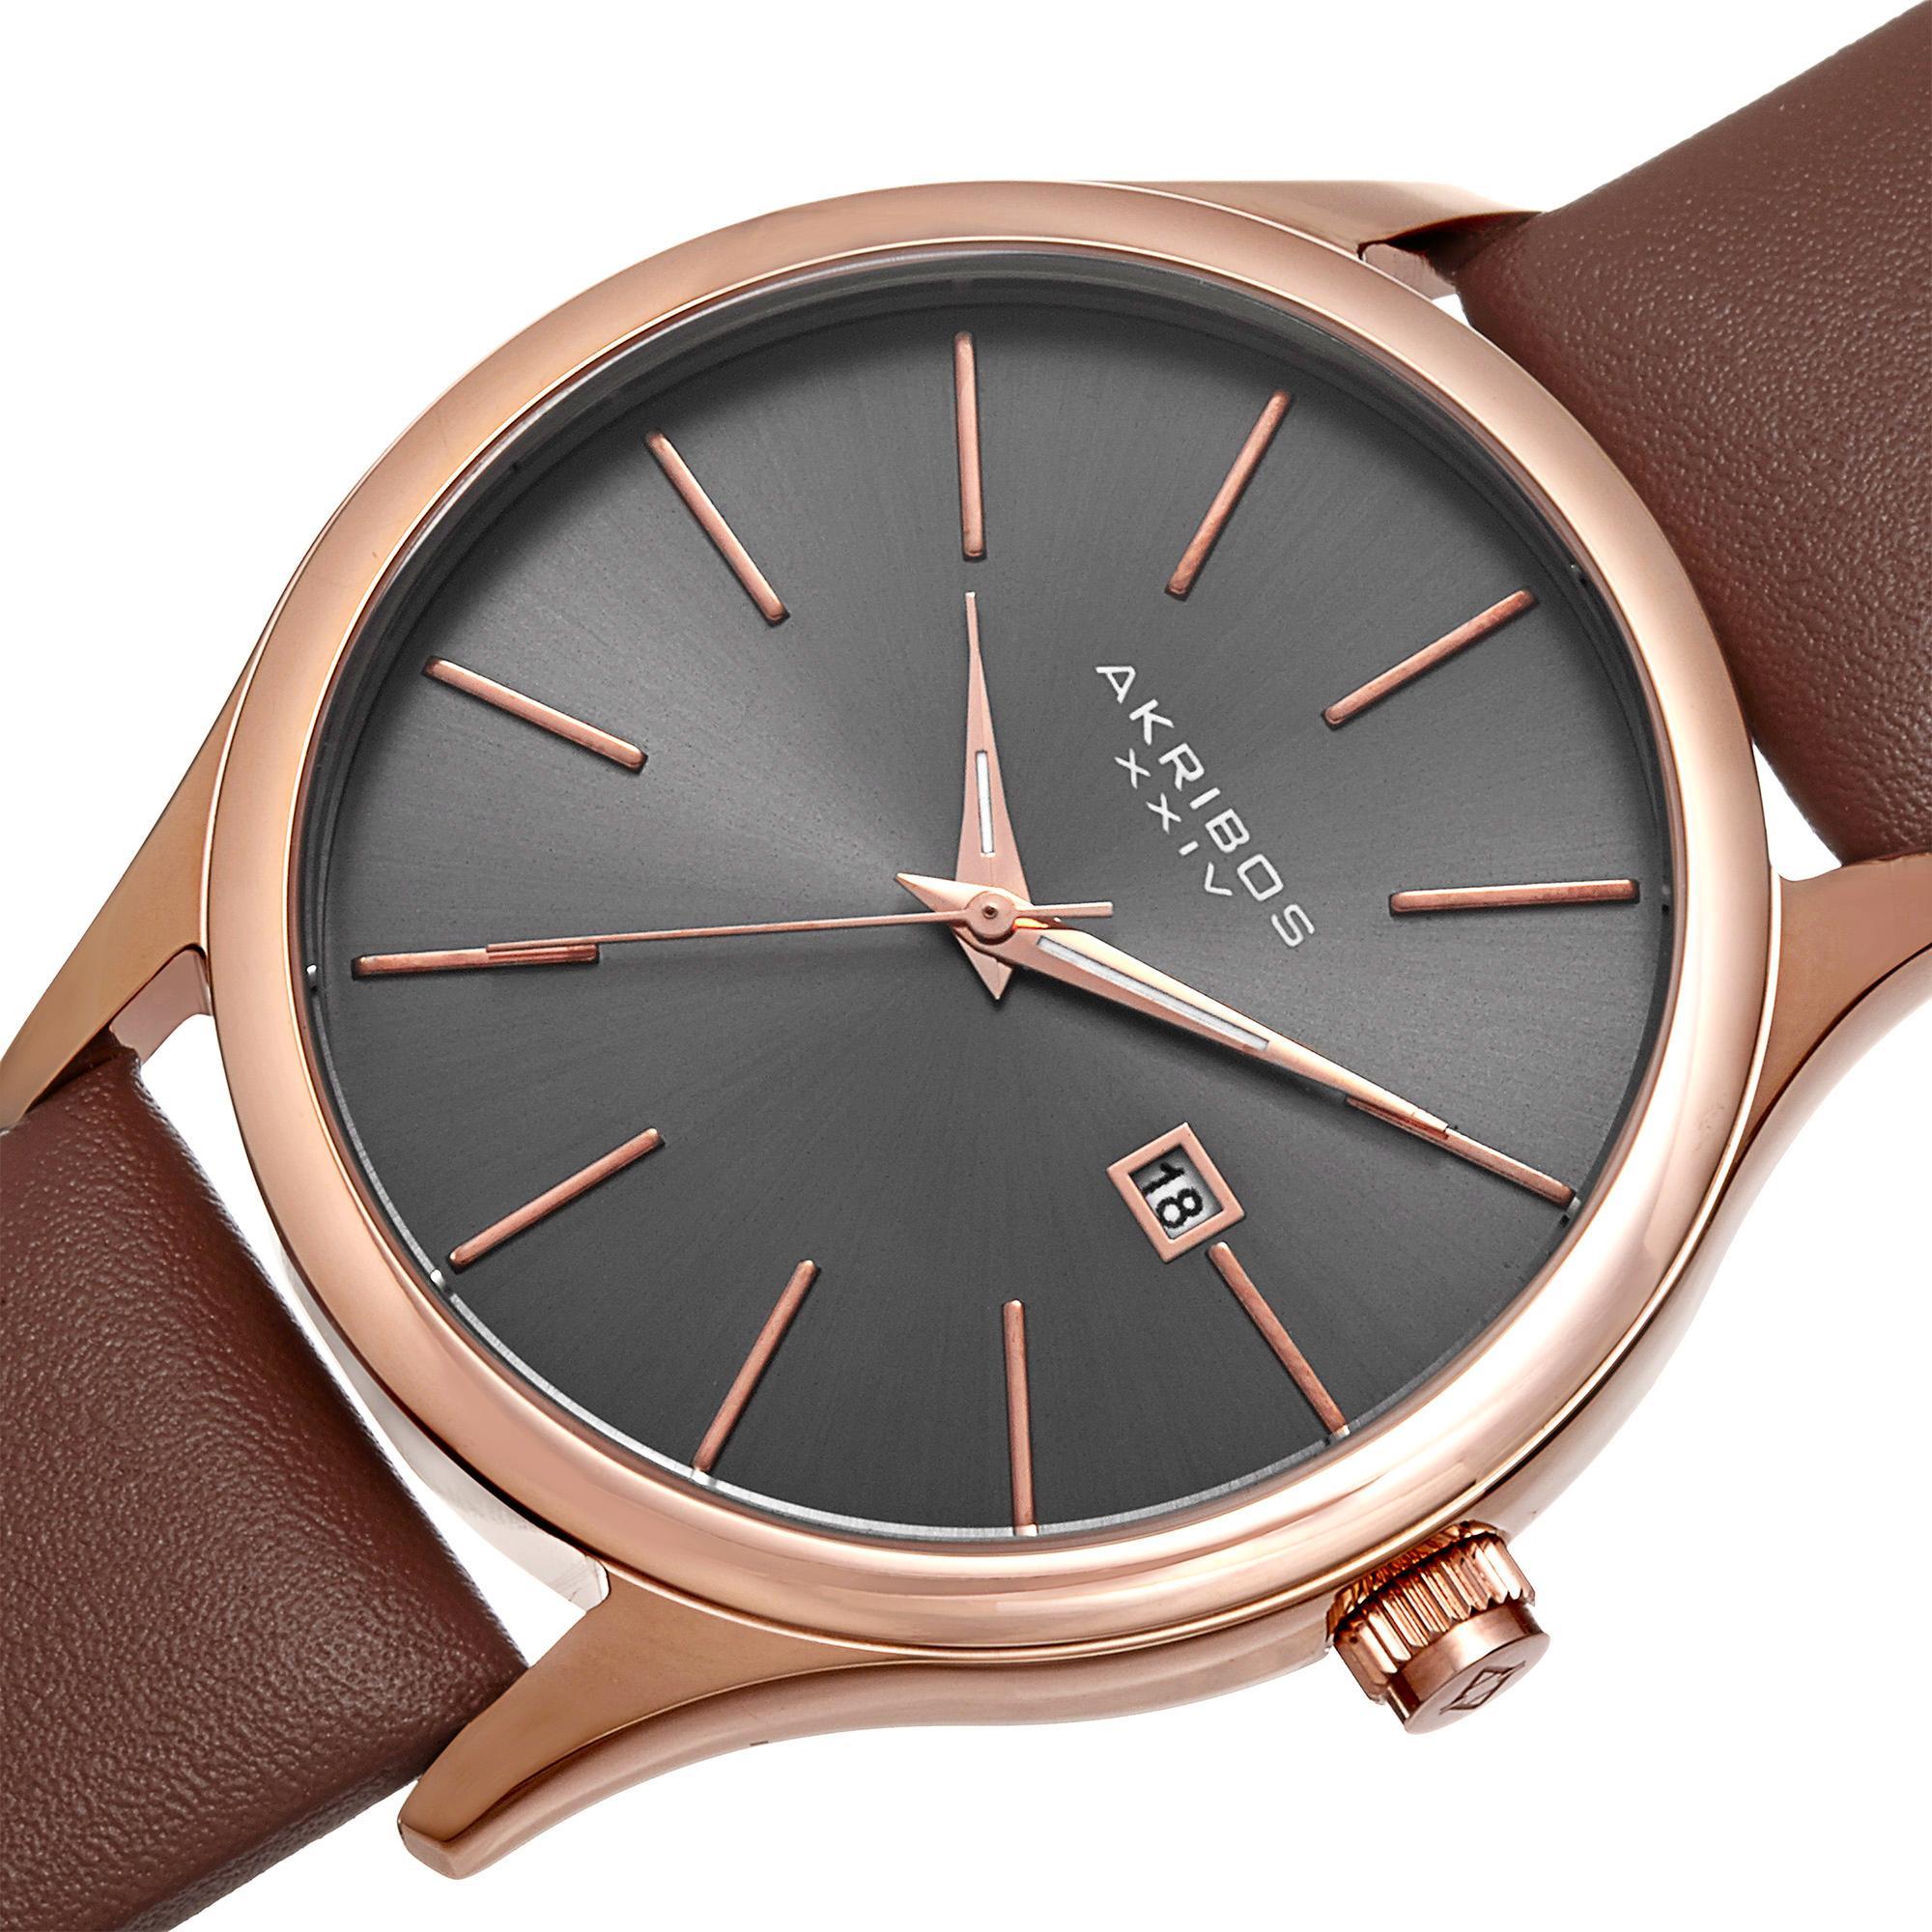 da5a7cff7 Amazon.com: Akribos XXIV Men's AK618RG Essential Dress Watch: Watches